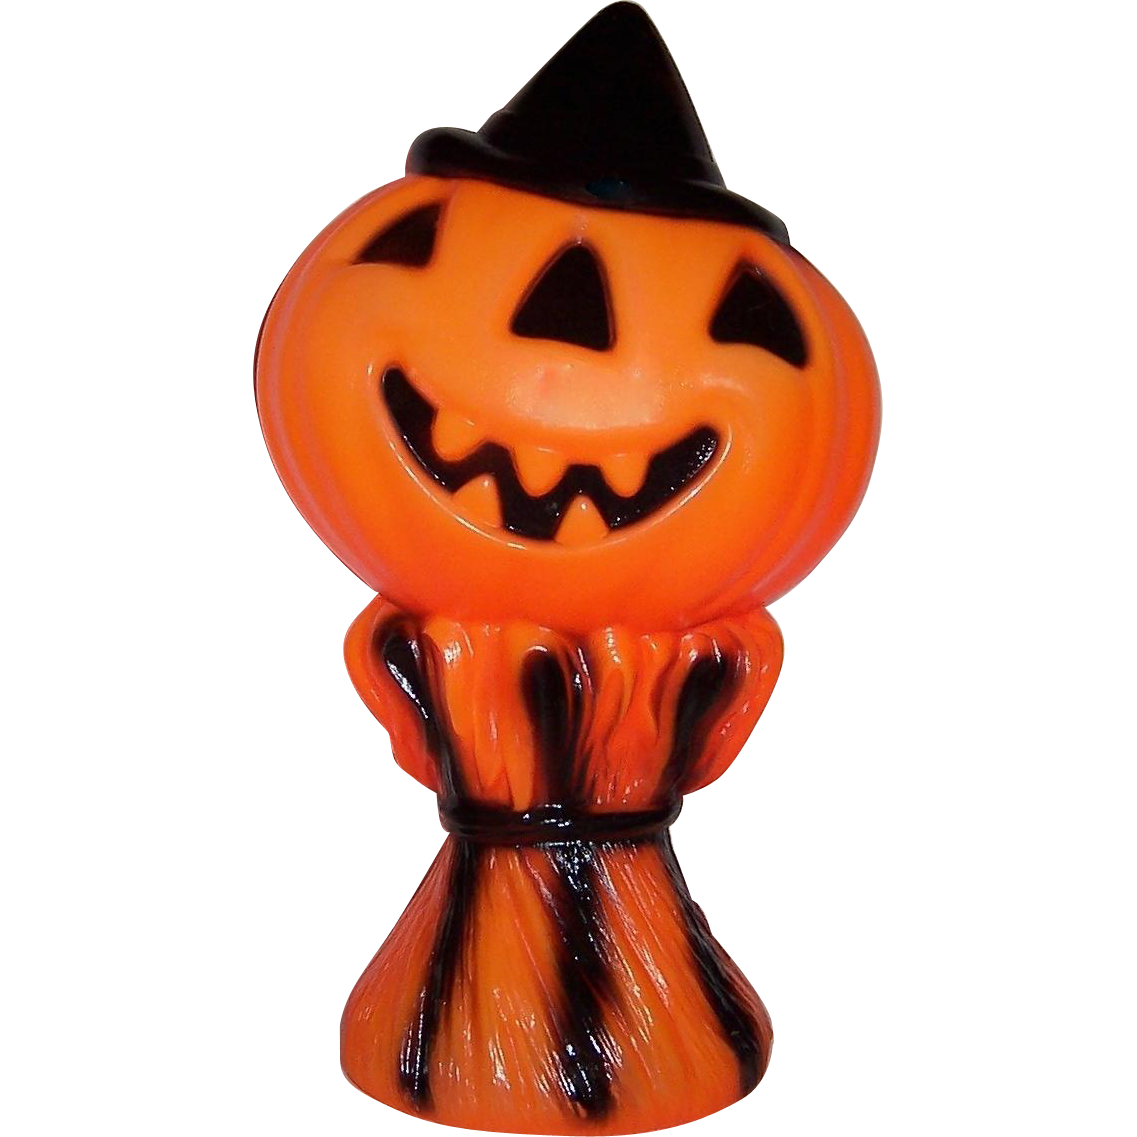 Vintage Halloween Light Up Blow Mold Jack-O-Lantern Pumpkin Empire Plastic